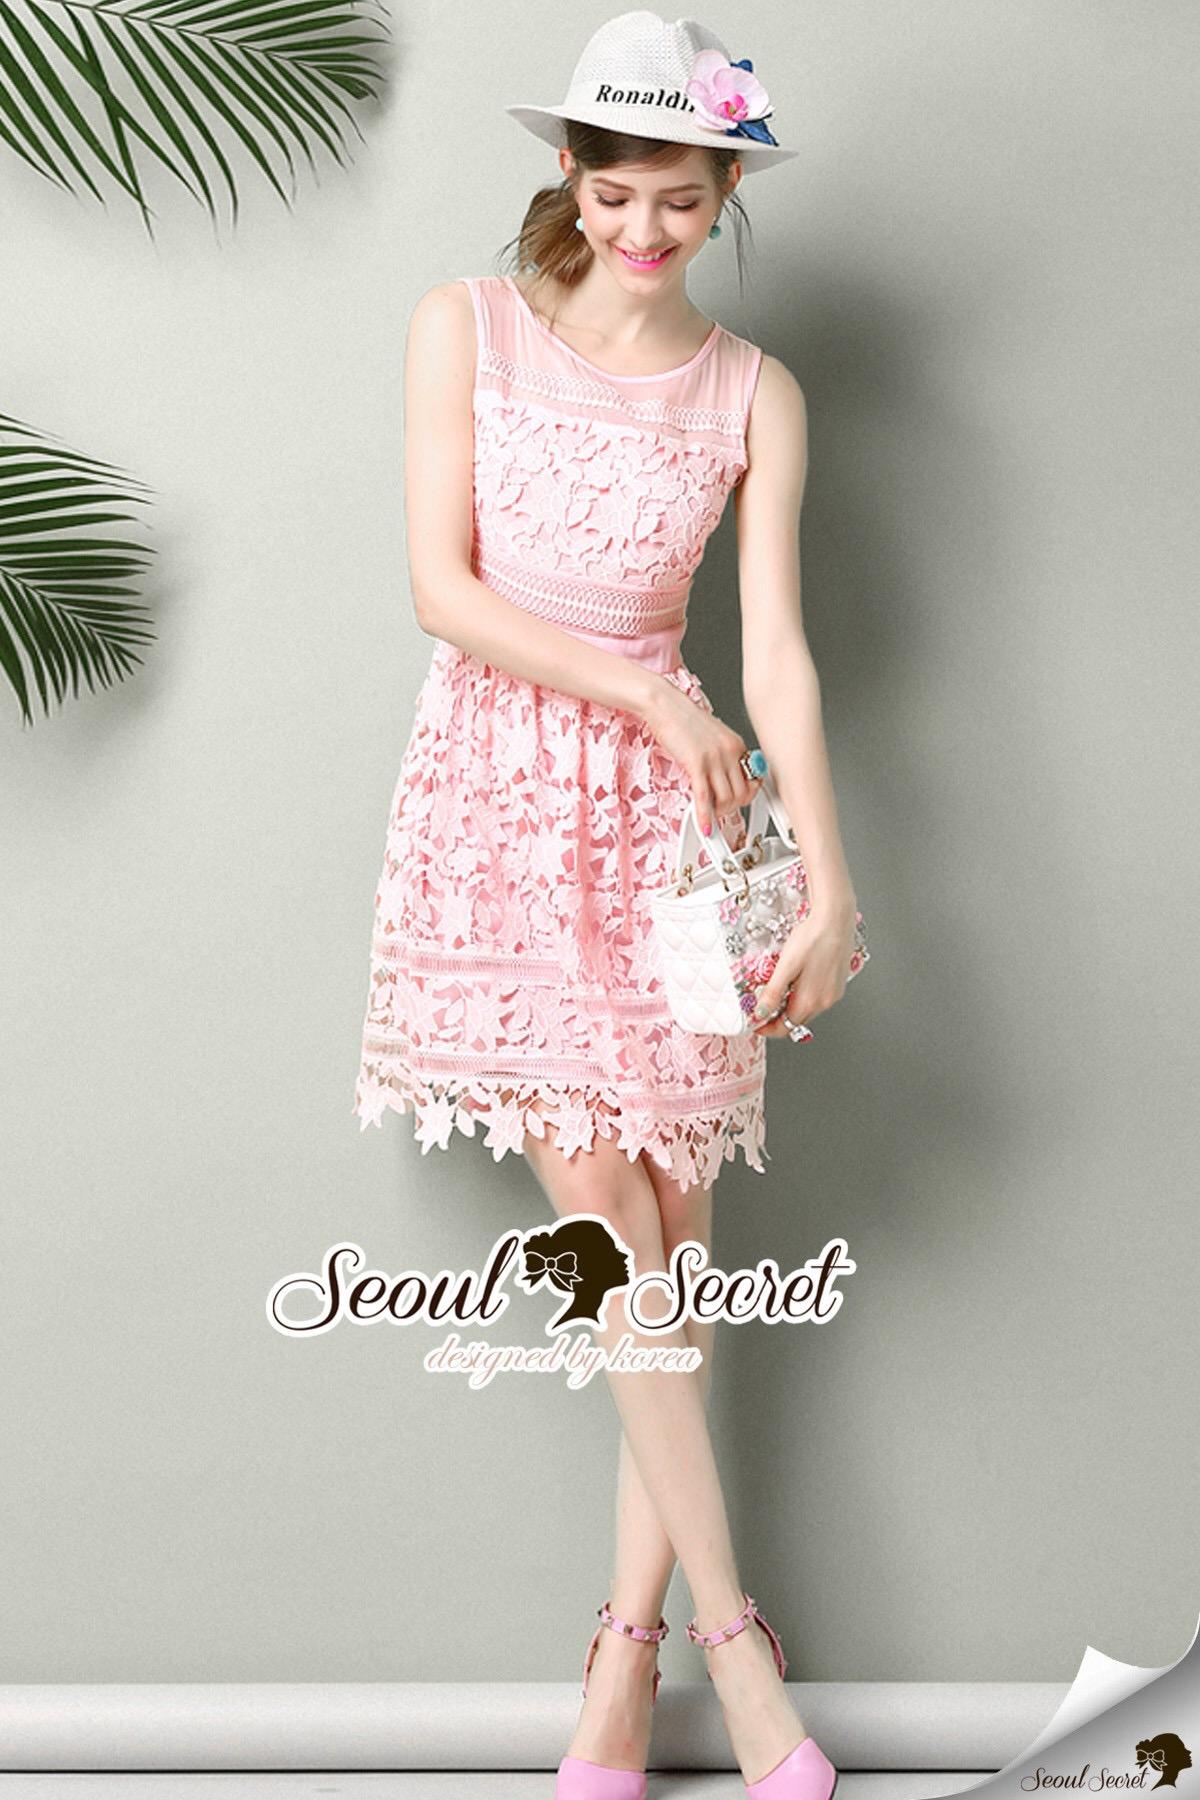 Seoul Secret Say's .... Pastel Pink Princess Lace Dress